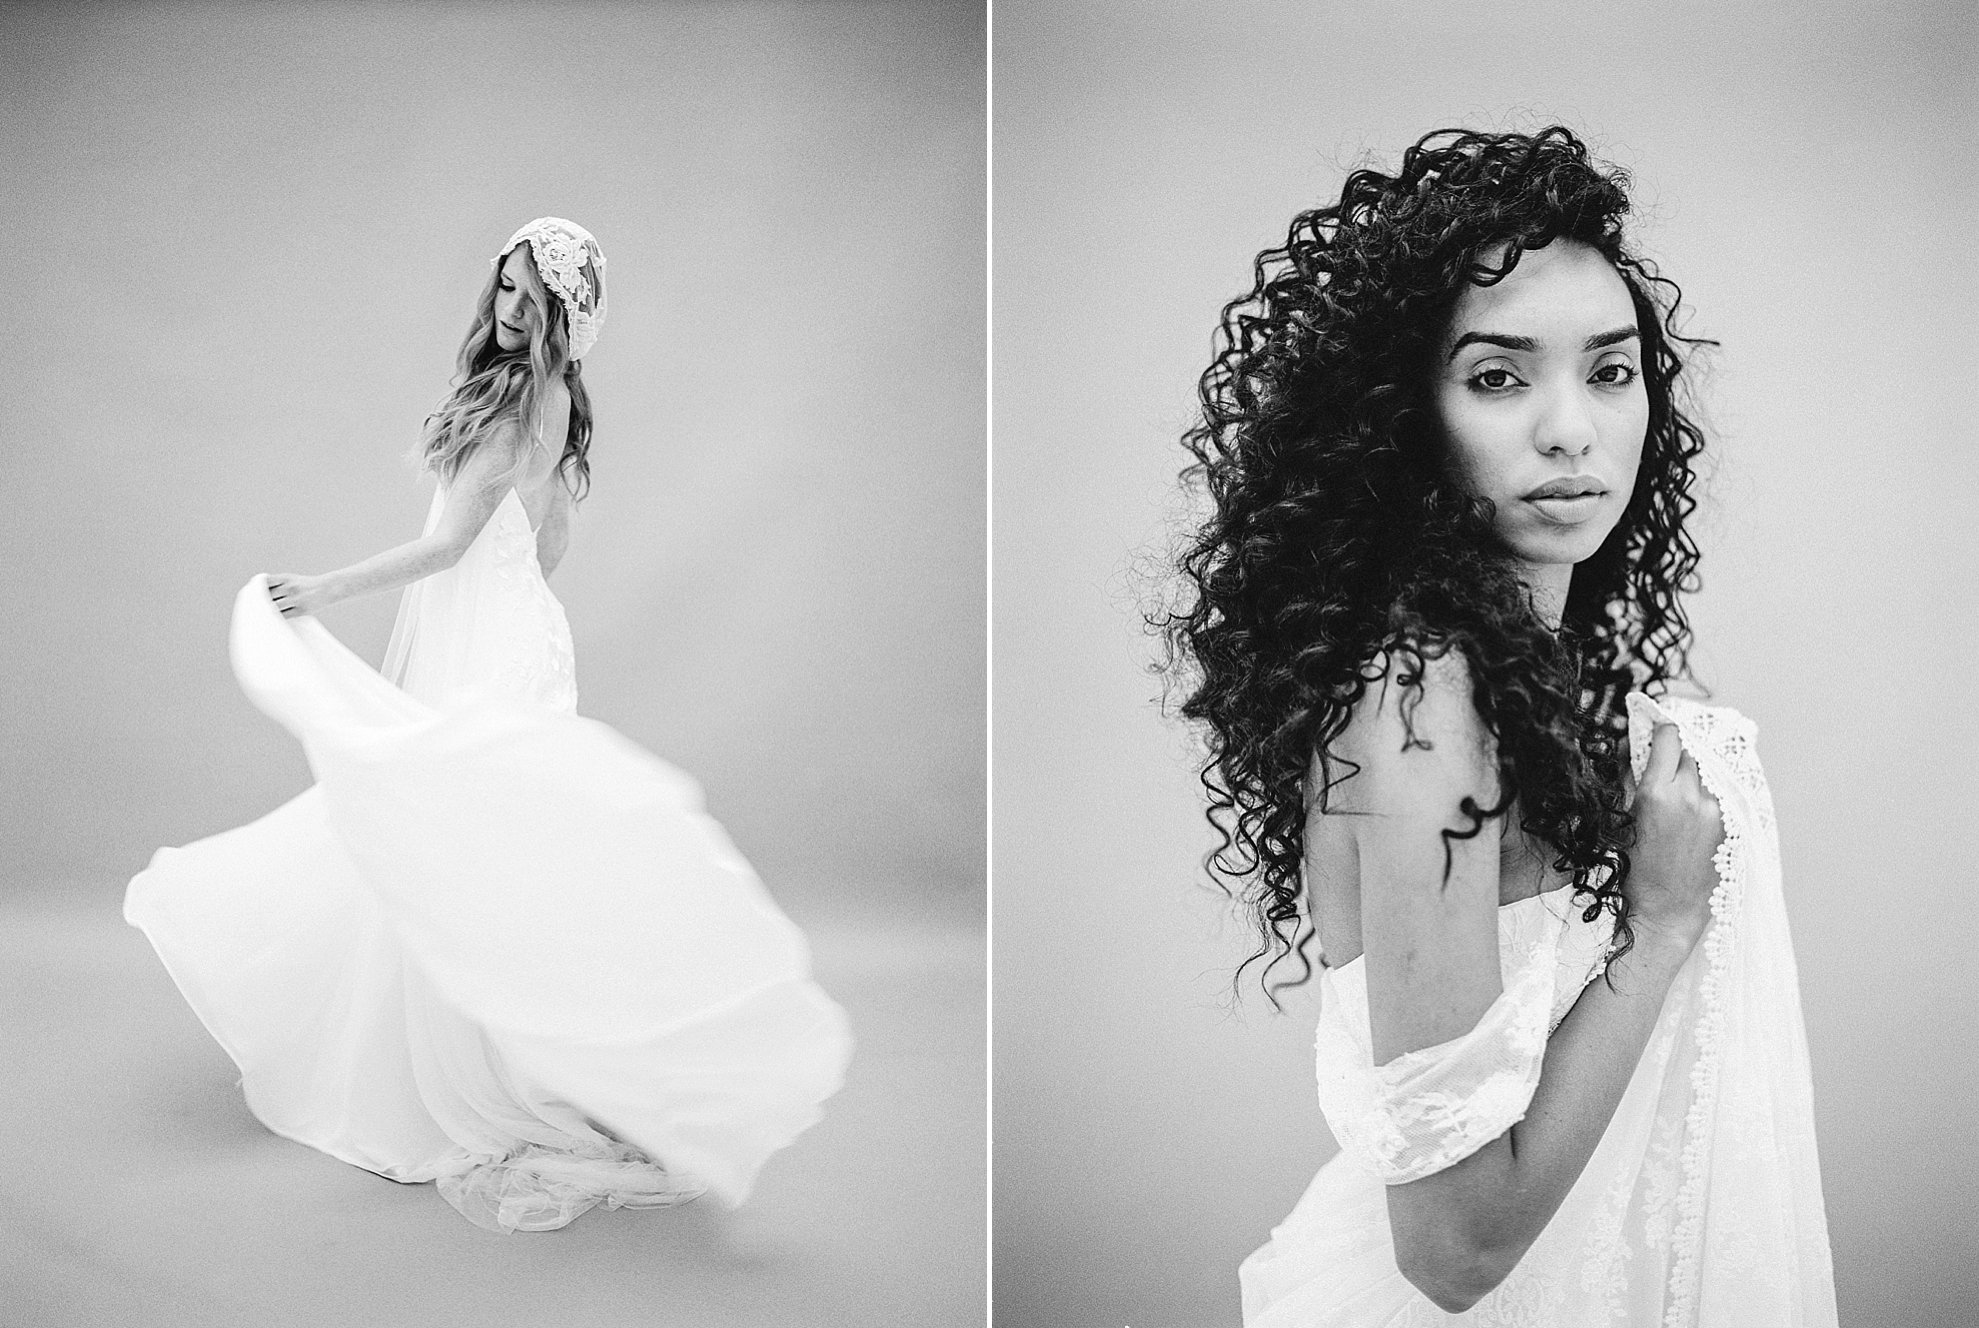 Amanda-Drost-Fotografie-mode-fashion-editorial-bridal_0004.jpg